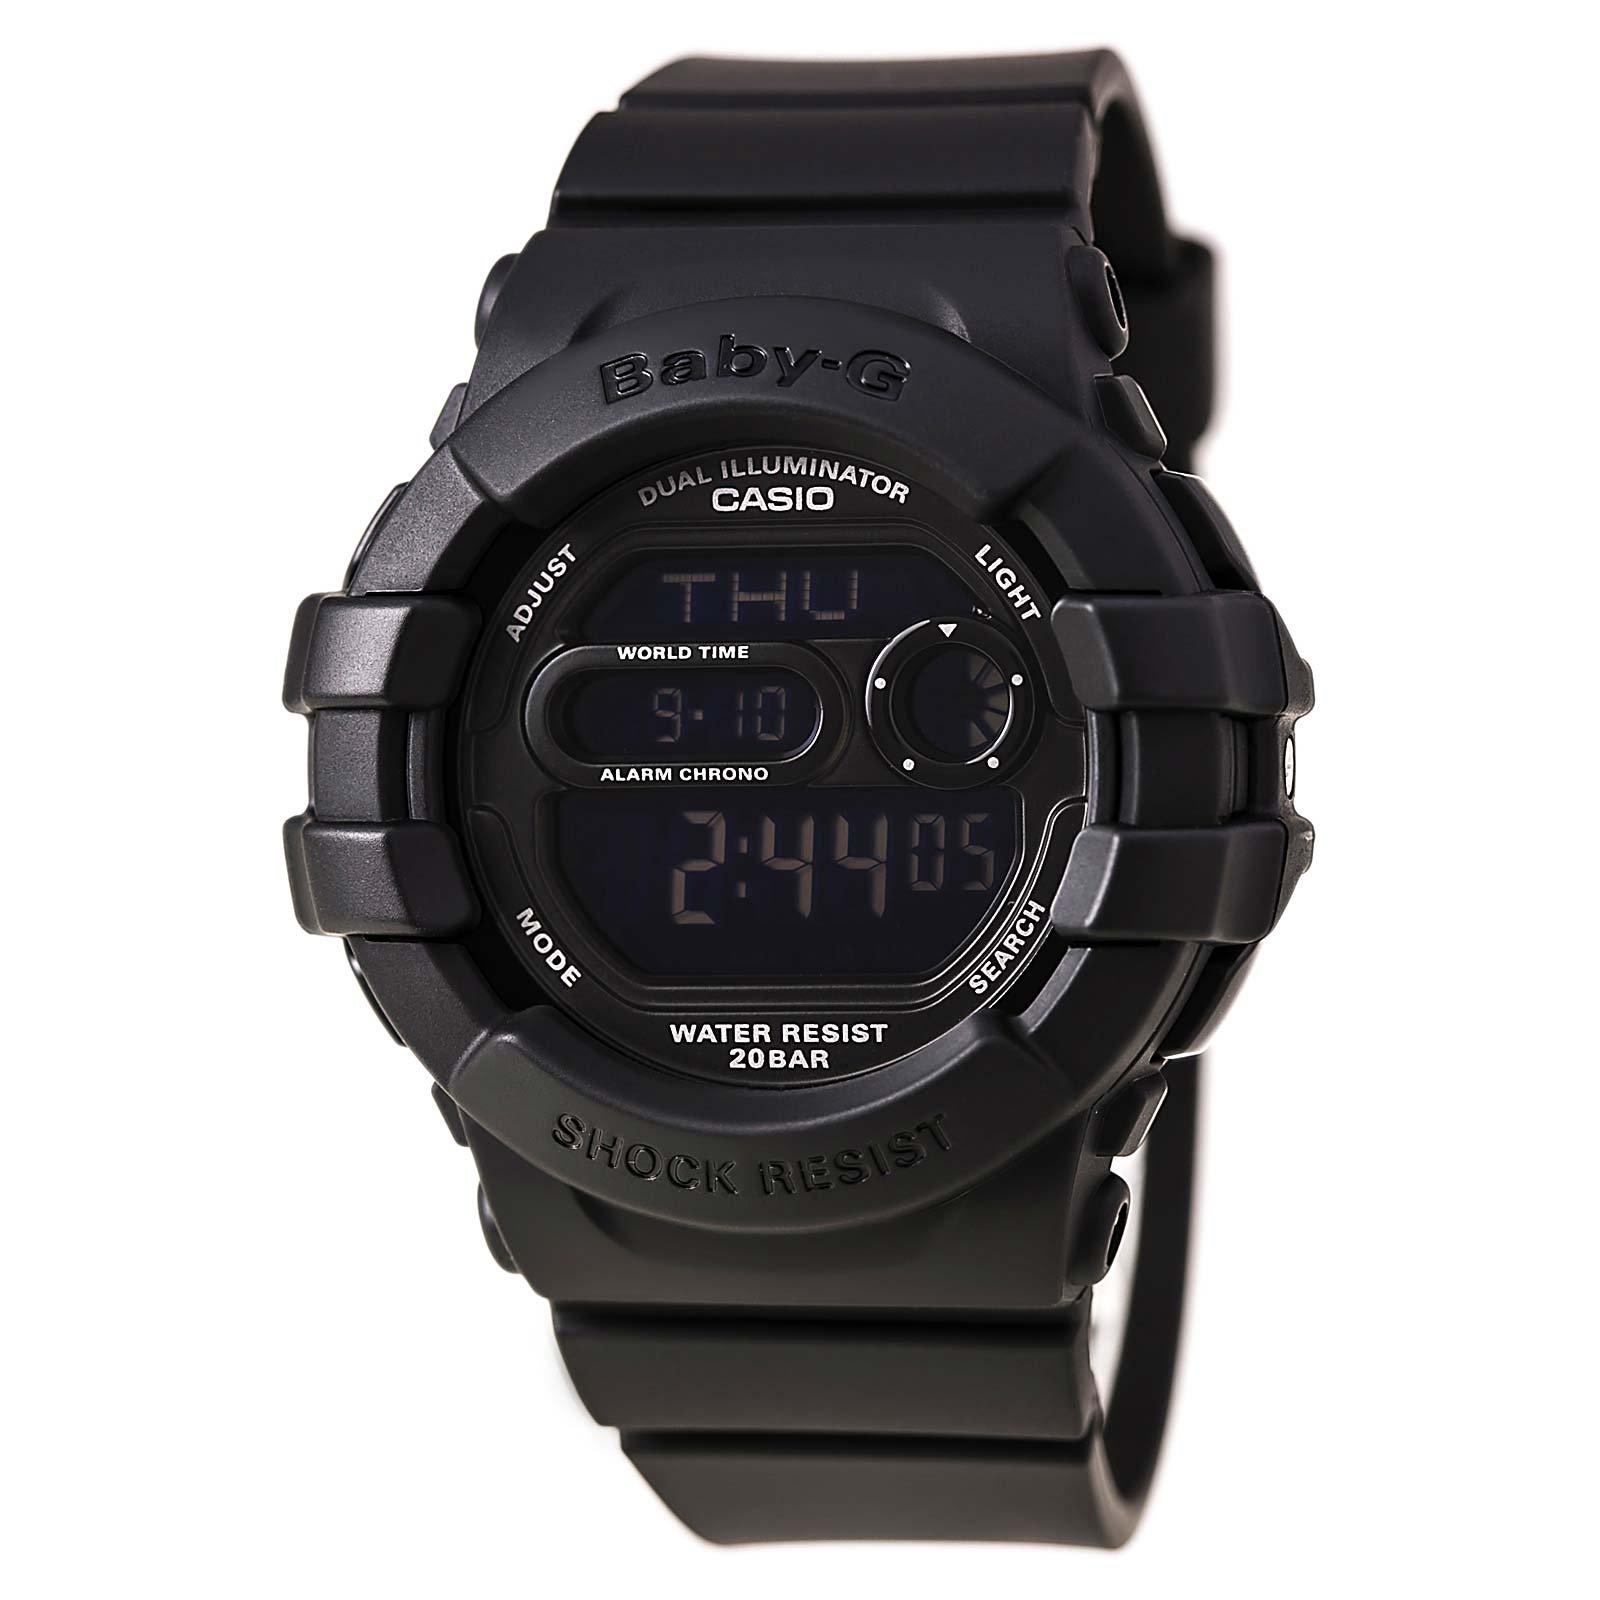 Casio Women's BGD140-1ACR Baby-G Shock-Resistant Multi-Function Digital Watch by Casio